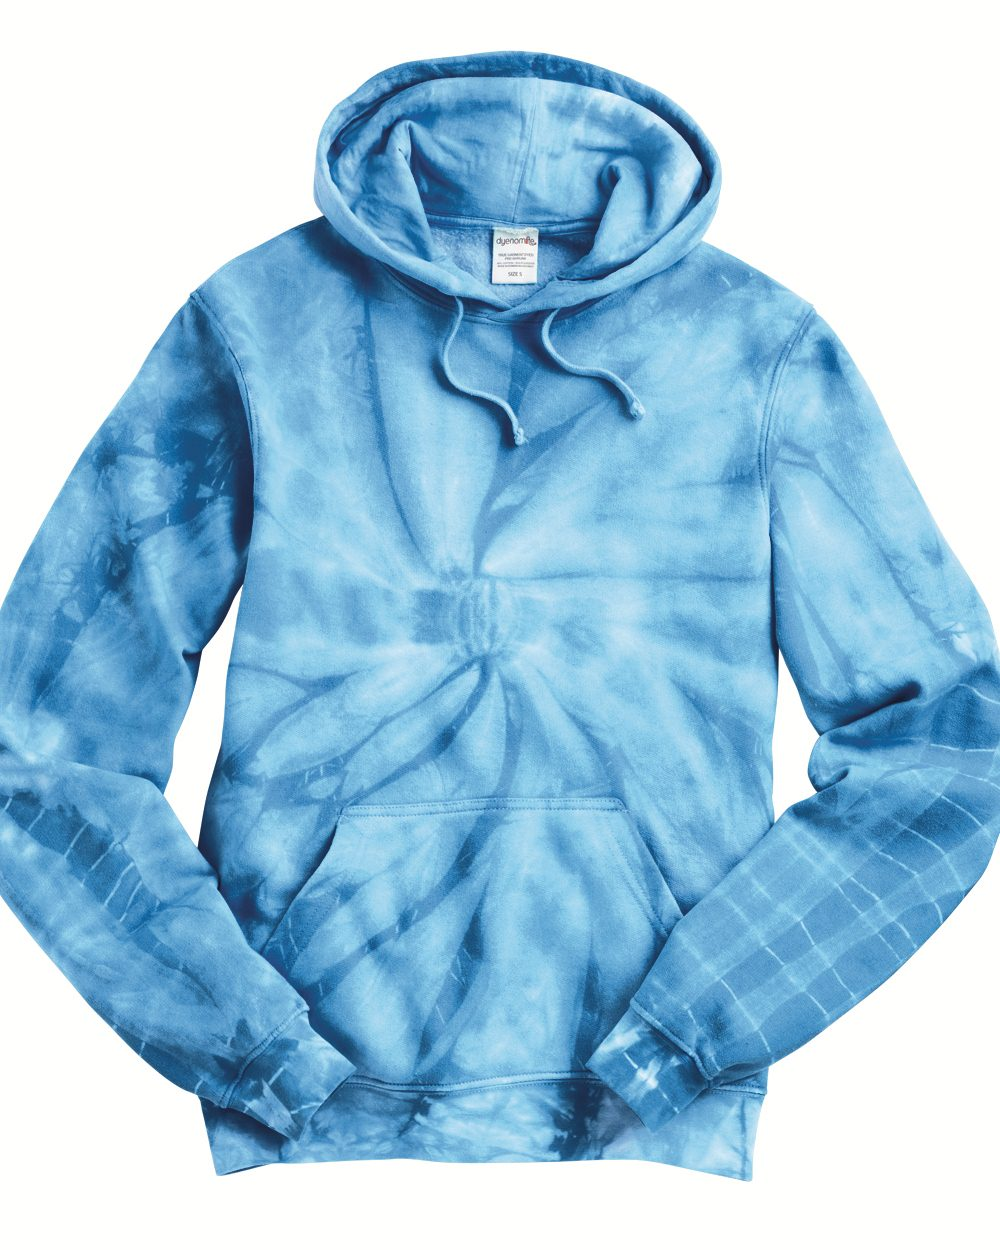 Tie-Dyed 854CY-Cyclone Hooded Sweatshirt